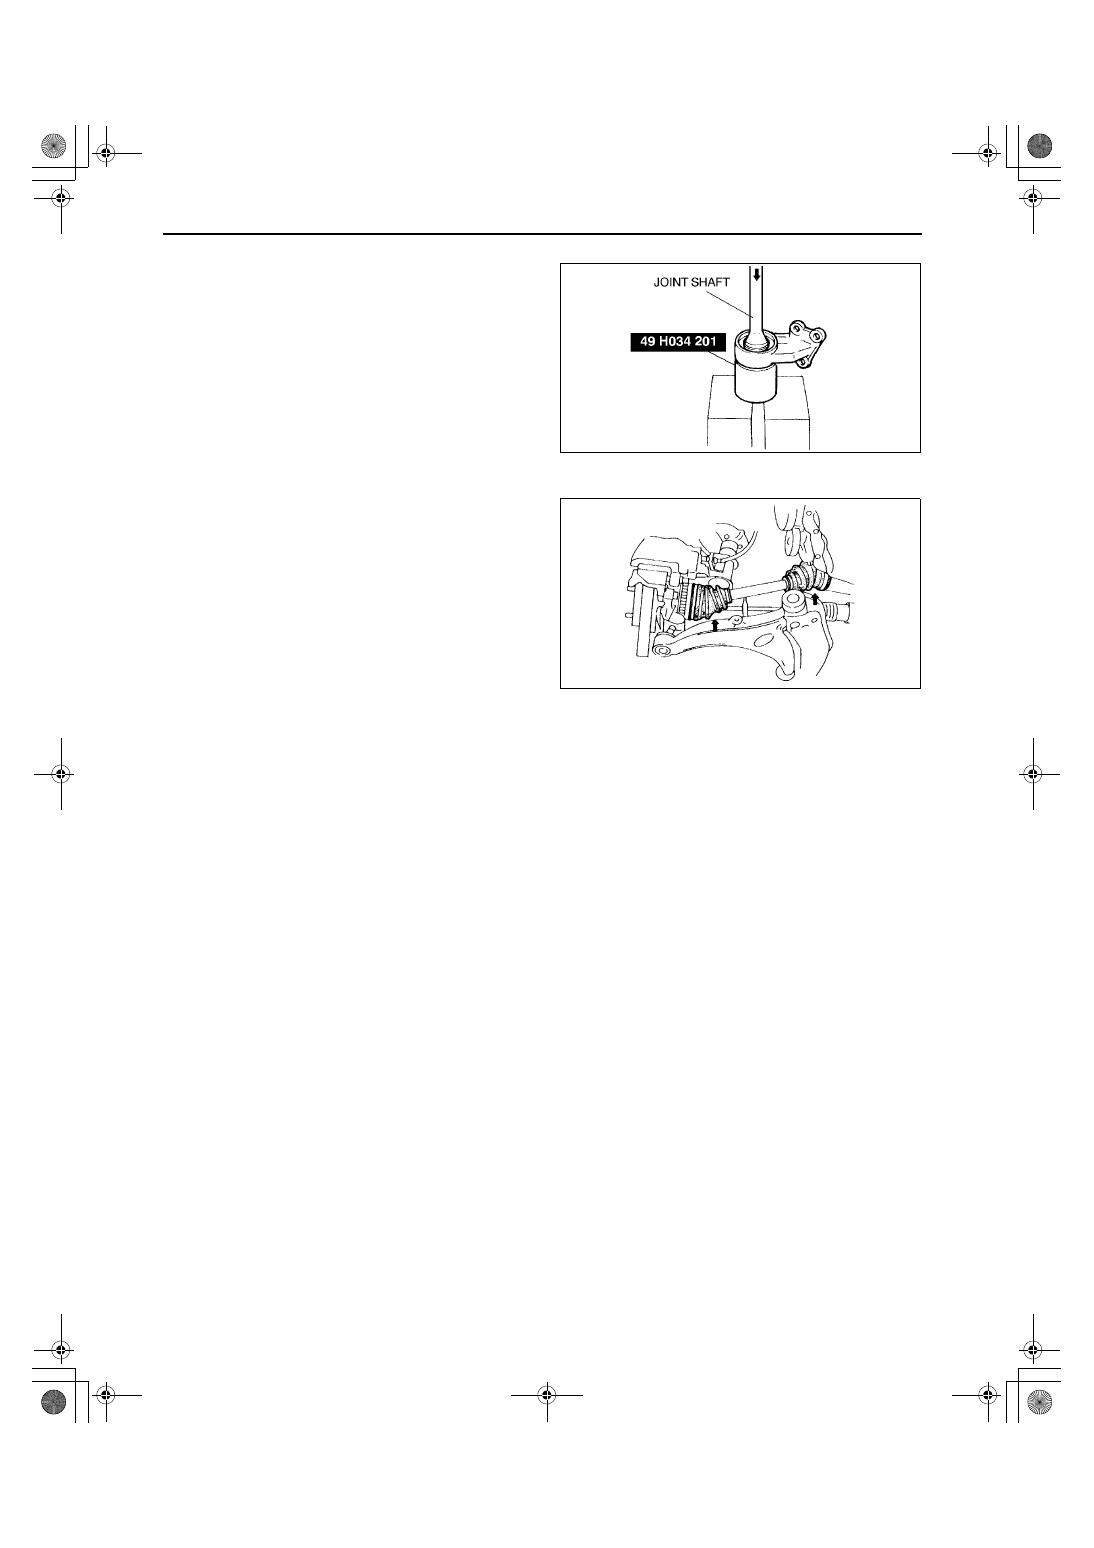 Mazda 3 Service Manual: Drive Shaft Inspection